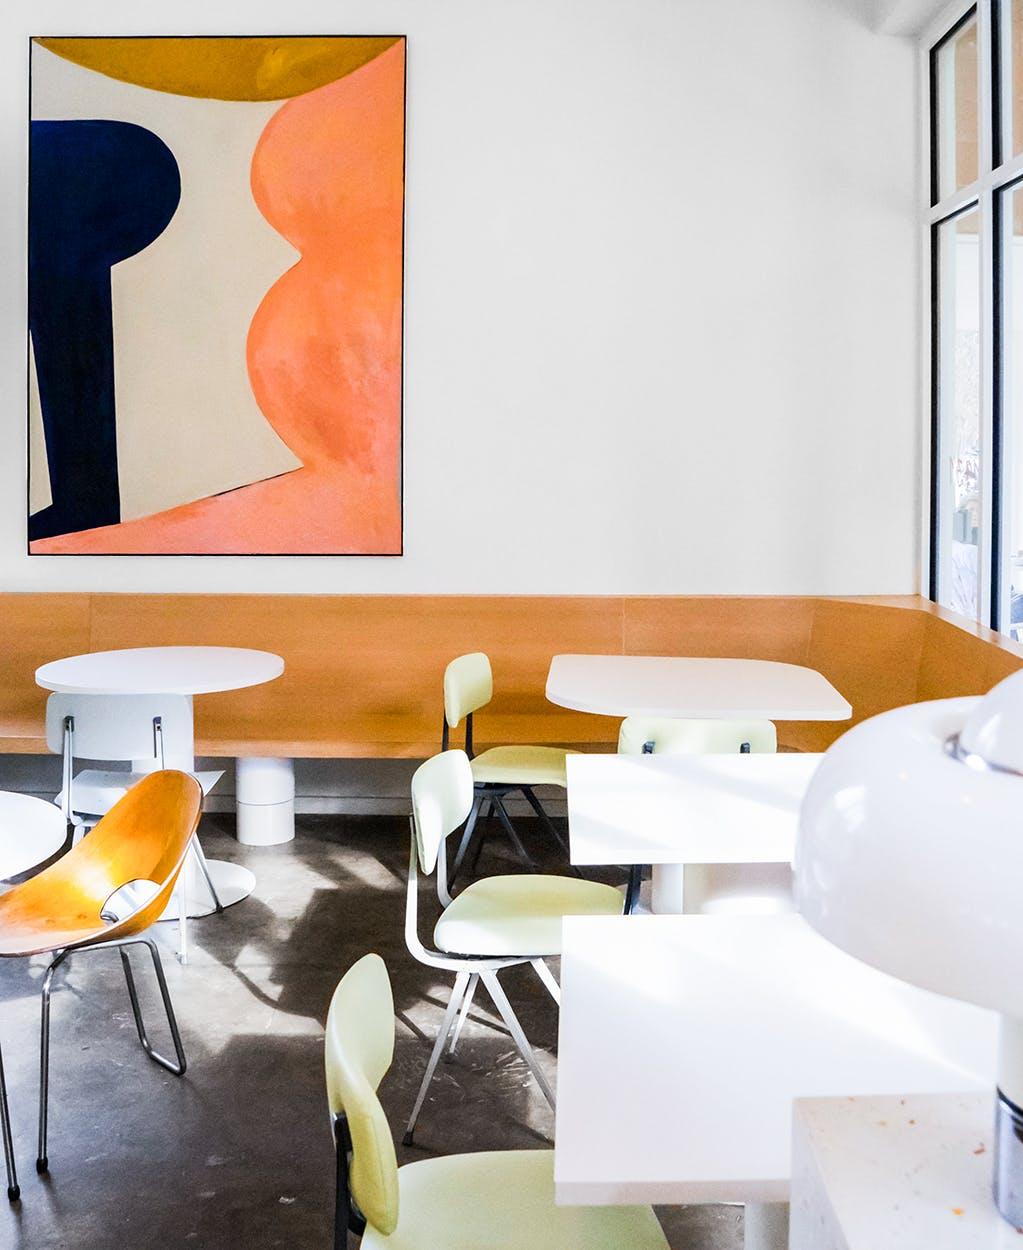 restaurant design interior of Vibrant in Houston